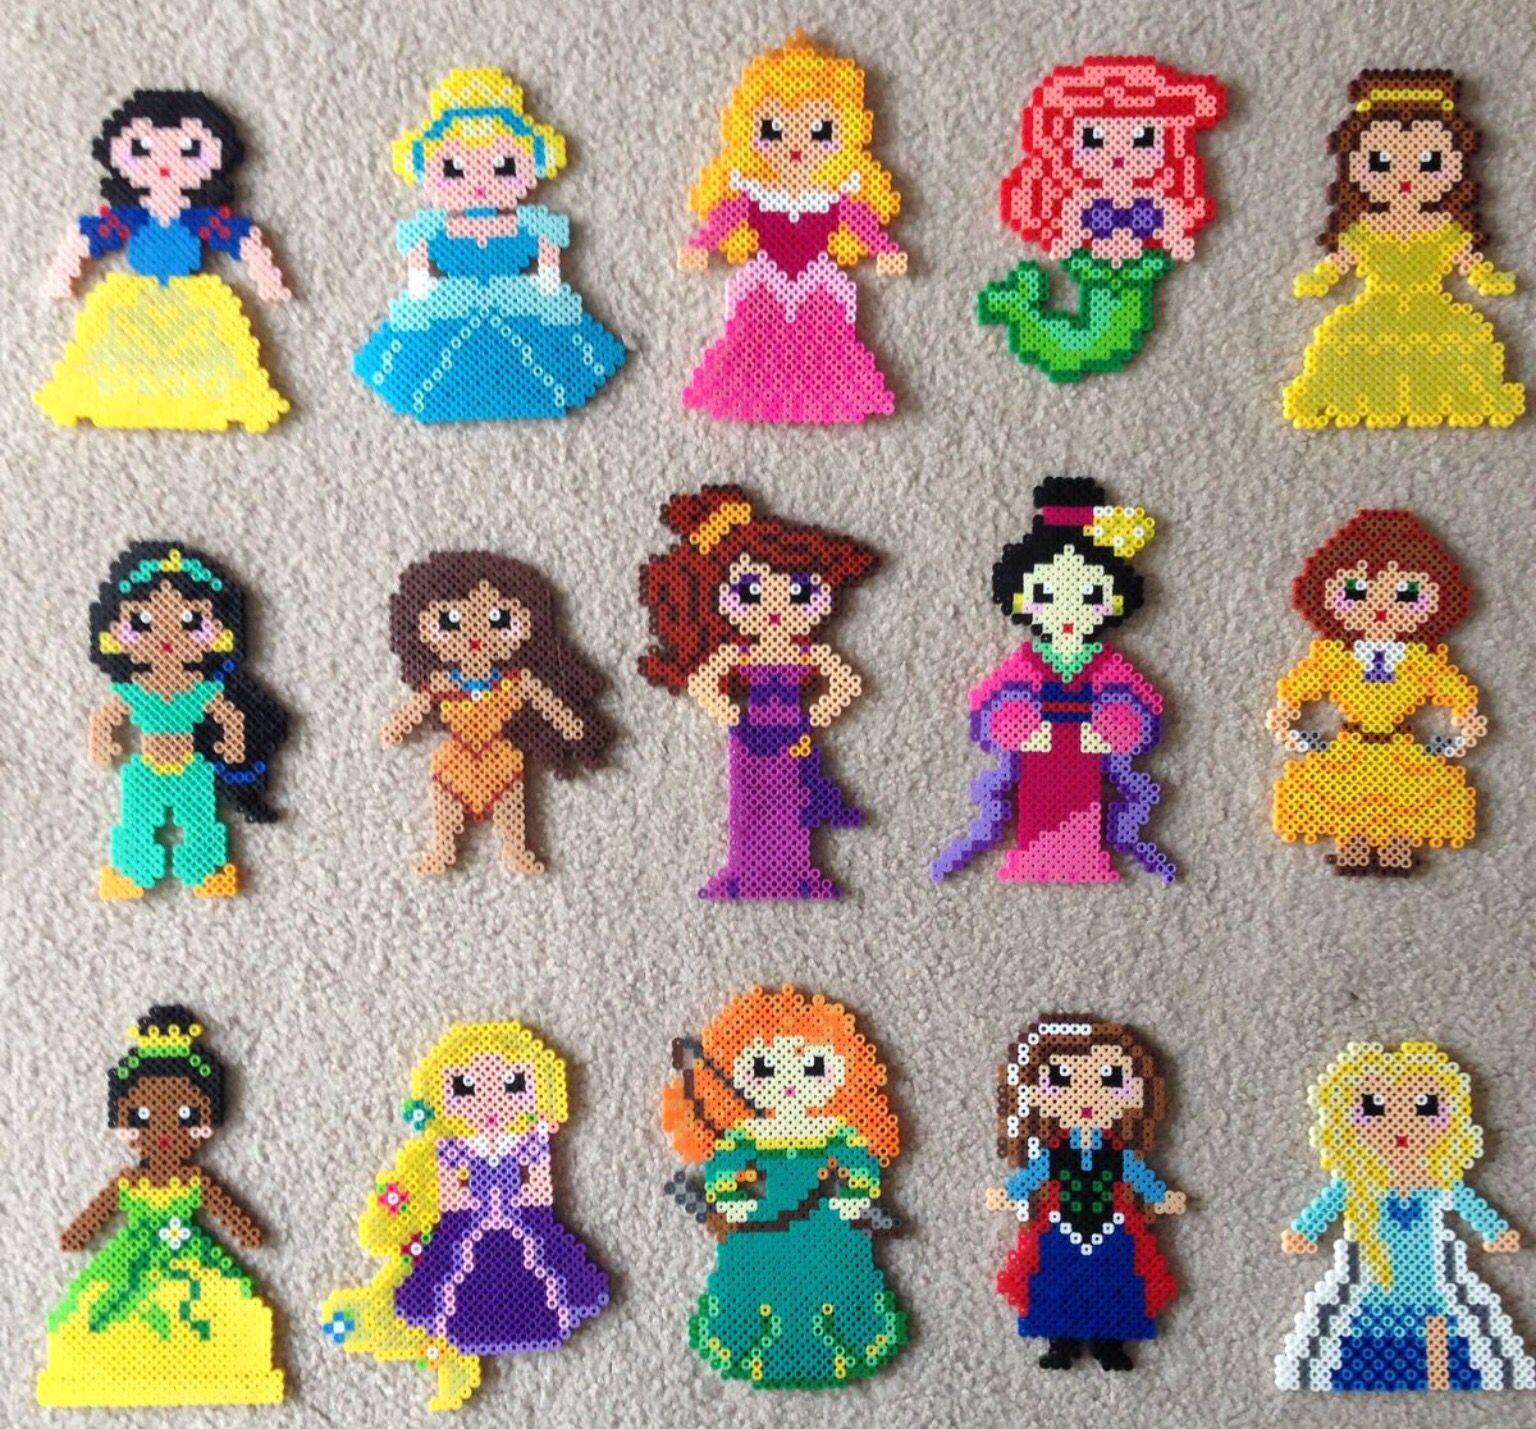 Princess Beads: Hama Beads Disney, Hama